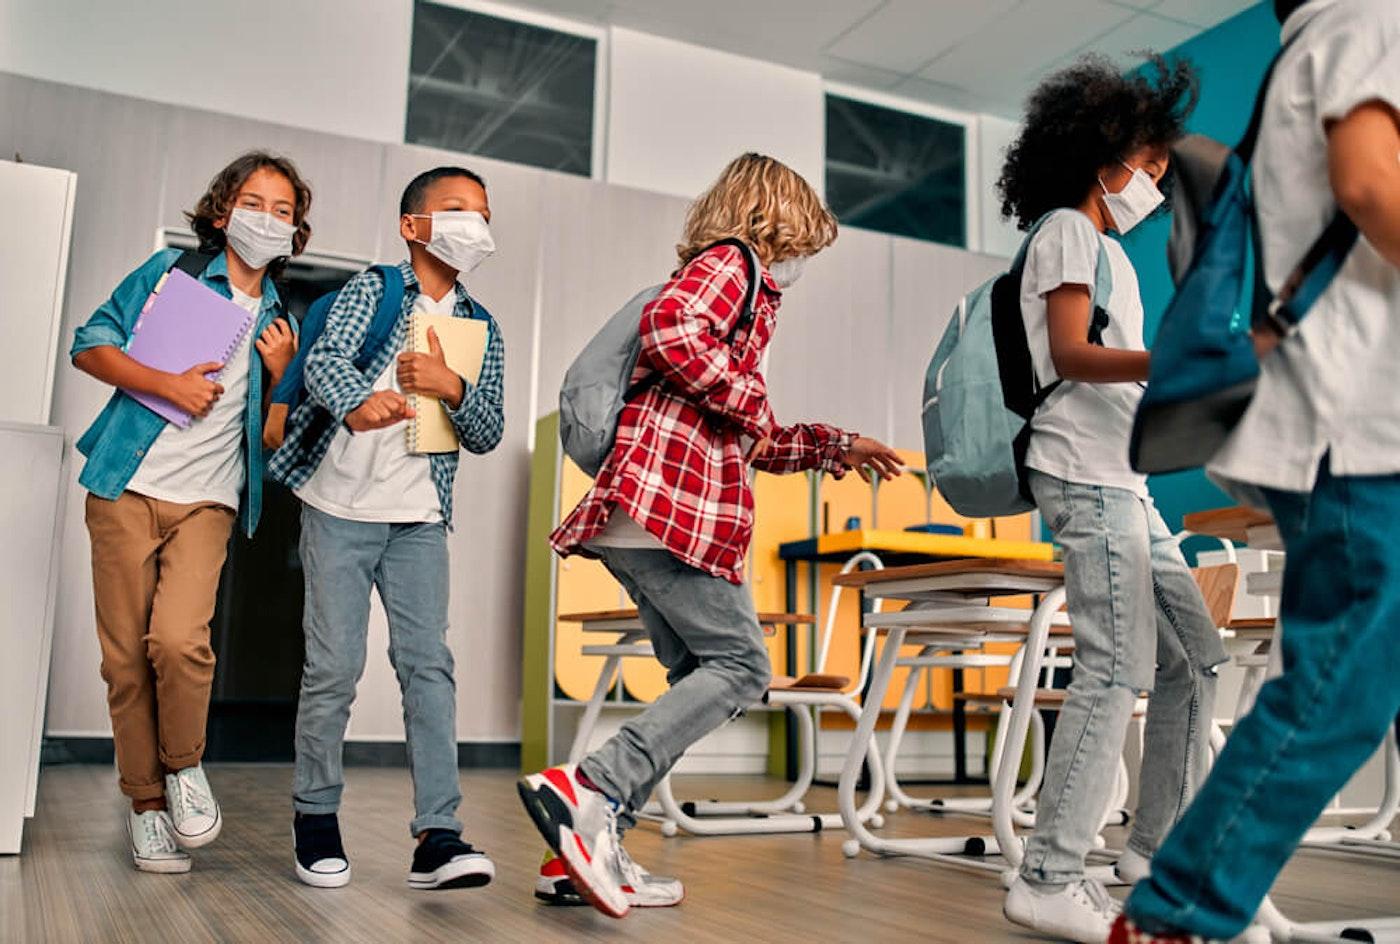 As North Carolina schools reopen, public health leaders will face pressure to require the COVID-19 vaccine. (Image via Shutterstock)